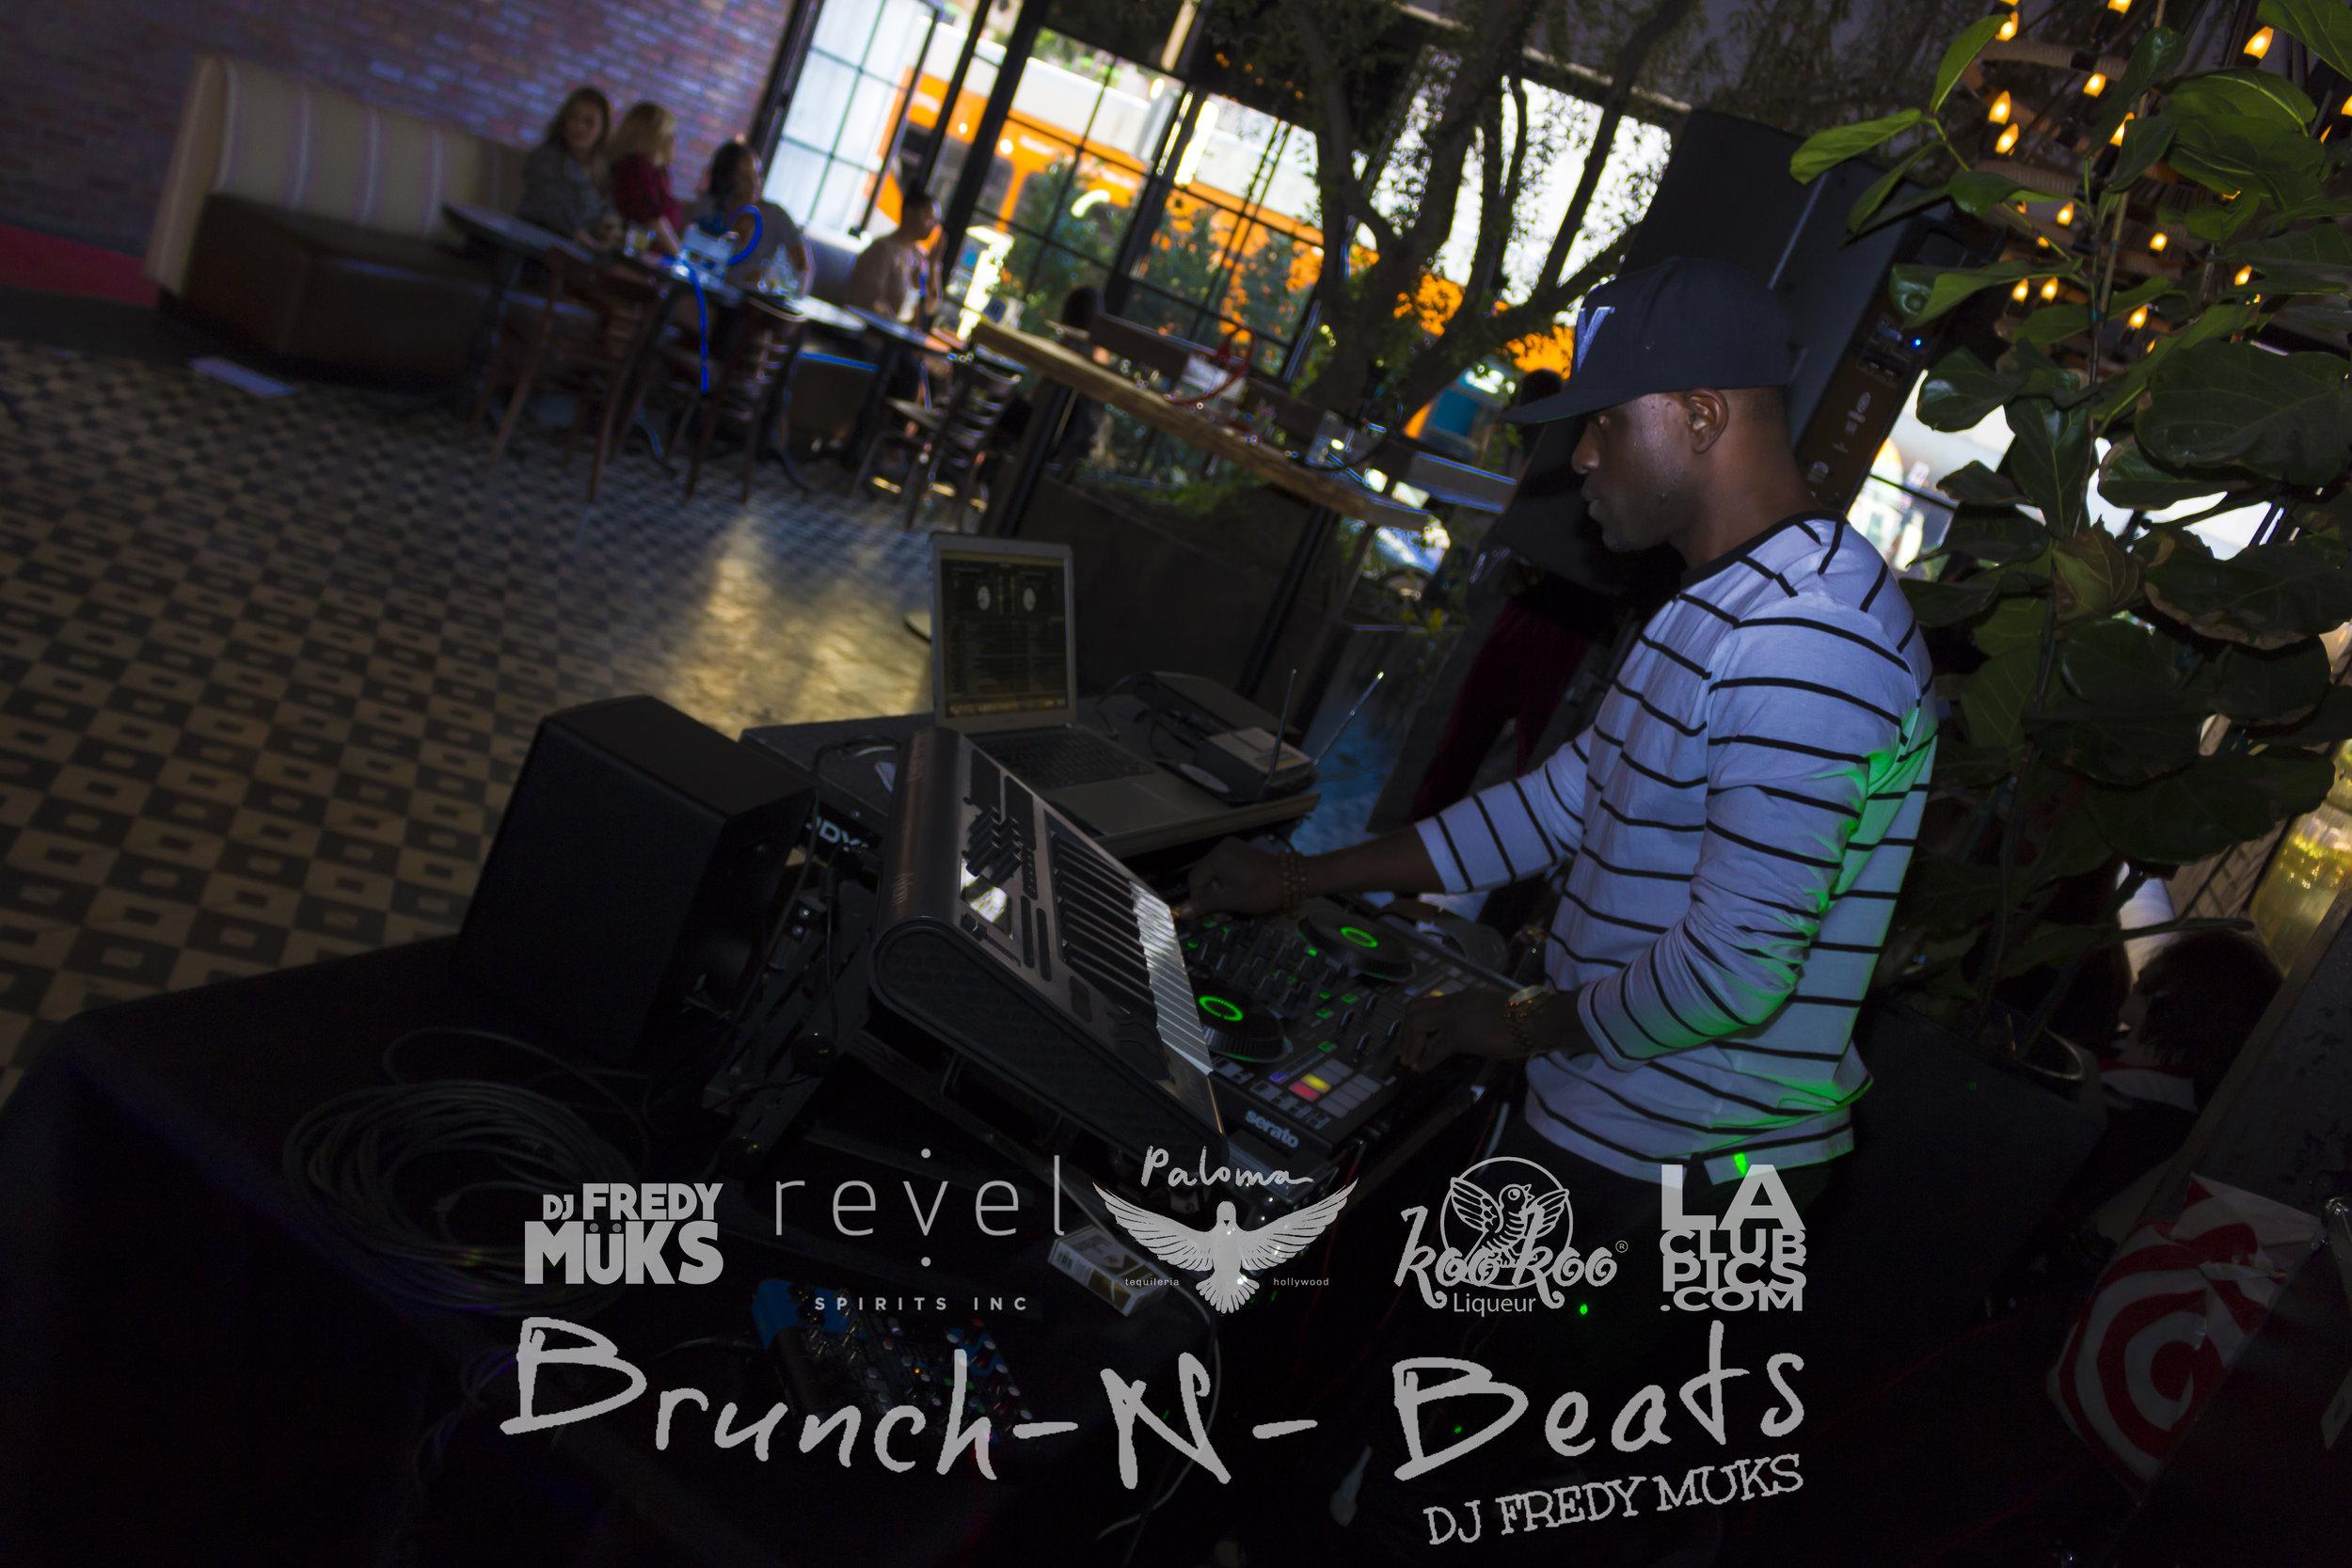 Brunch-N-Beats - Paloma Hollywood - 02-25-18_143.jpg